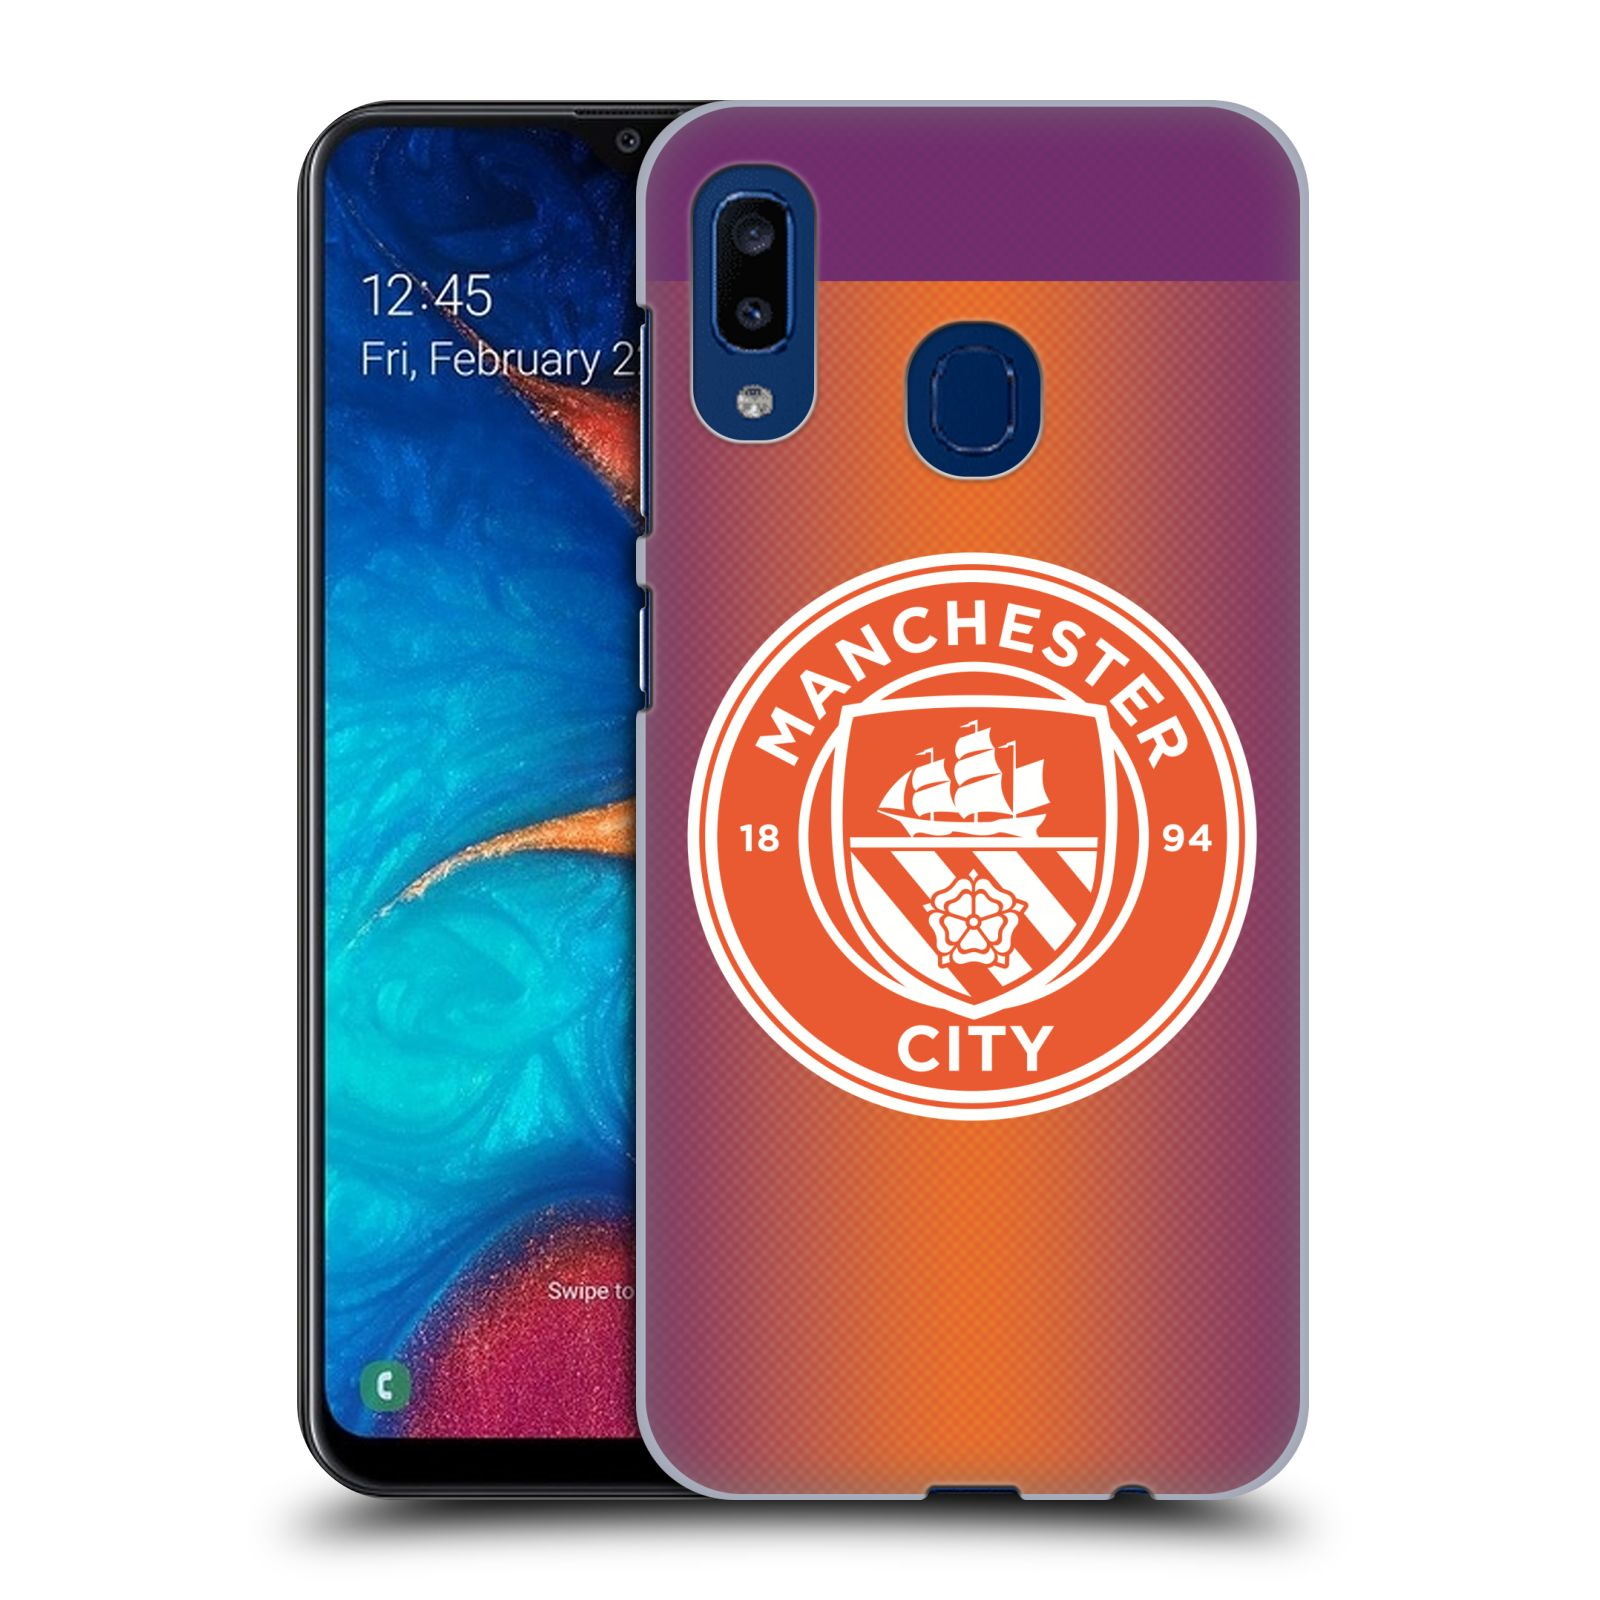 Plastové pouzdro na mobil Samsung Galaxy A20 - Head Case - Manchester City FC - Oranžové nové logo